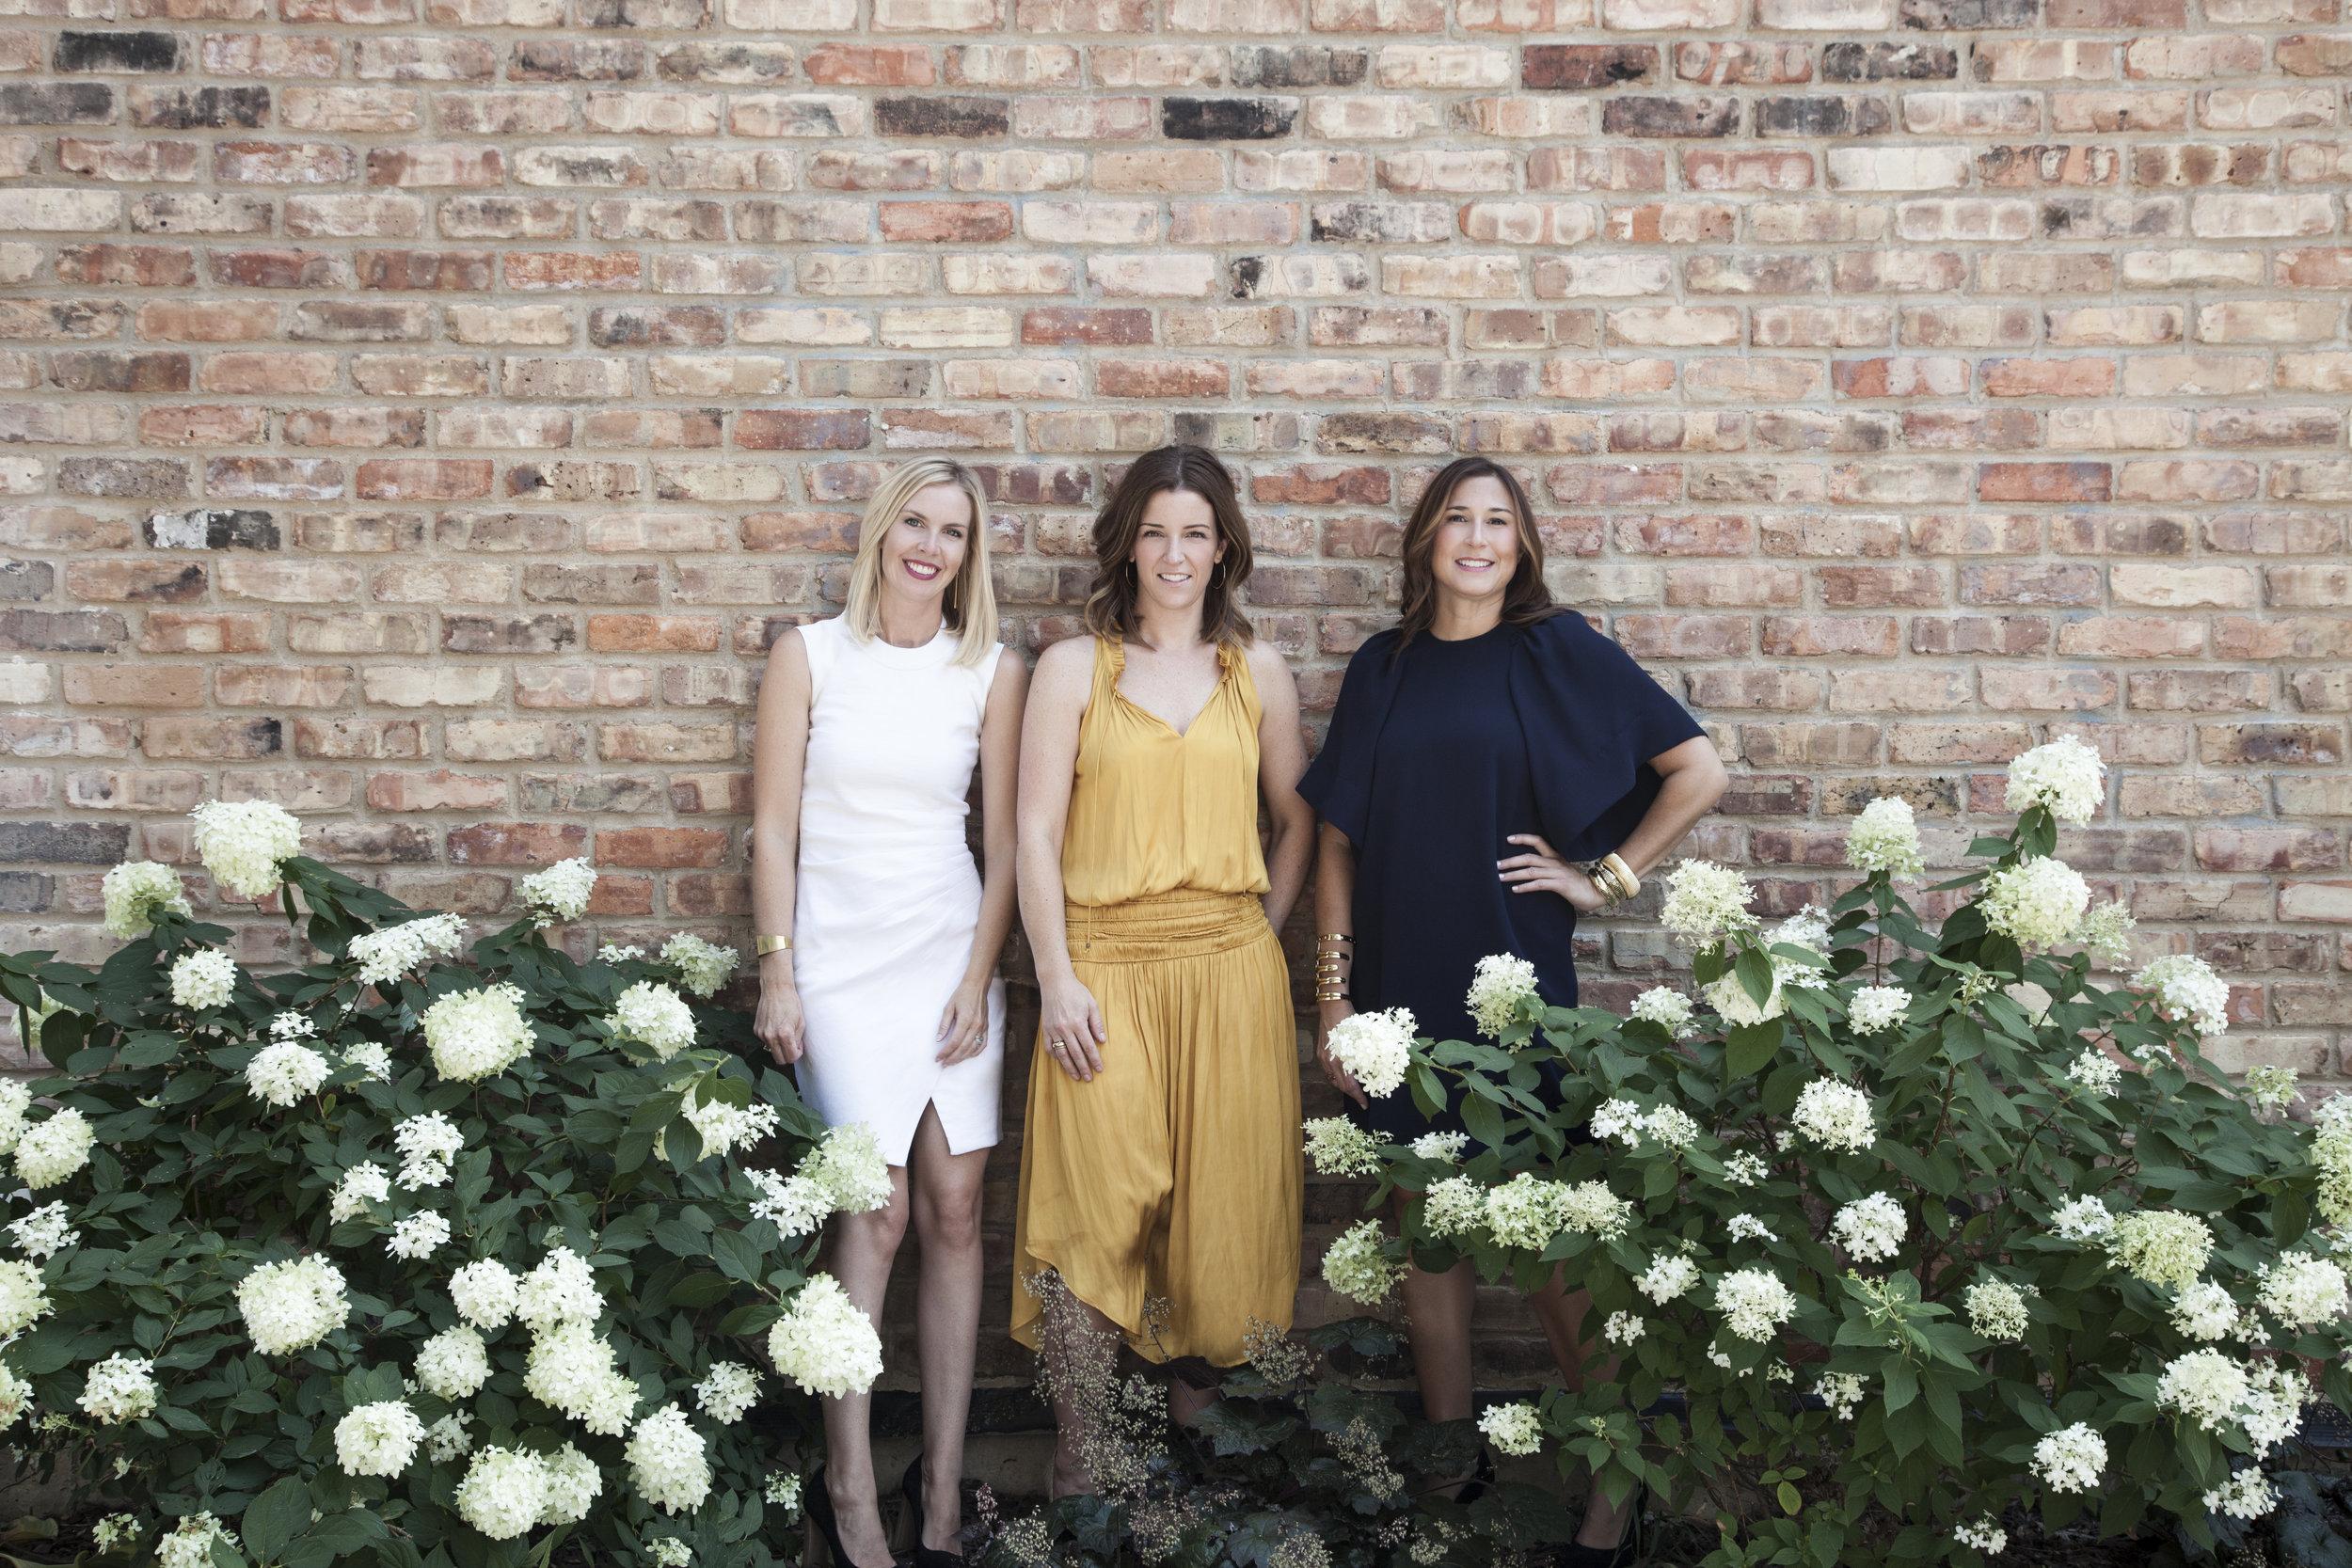 Left to right: Kristen Ekeland, Jennie Bishop, and Melissa Benham; Photo credit: Erika Dufour Photography